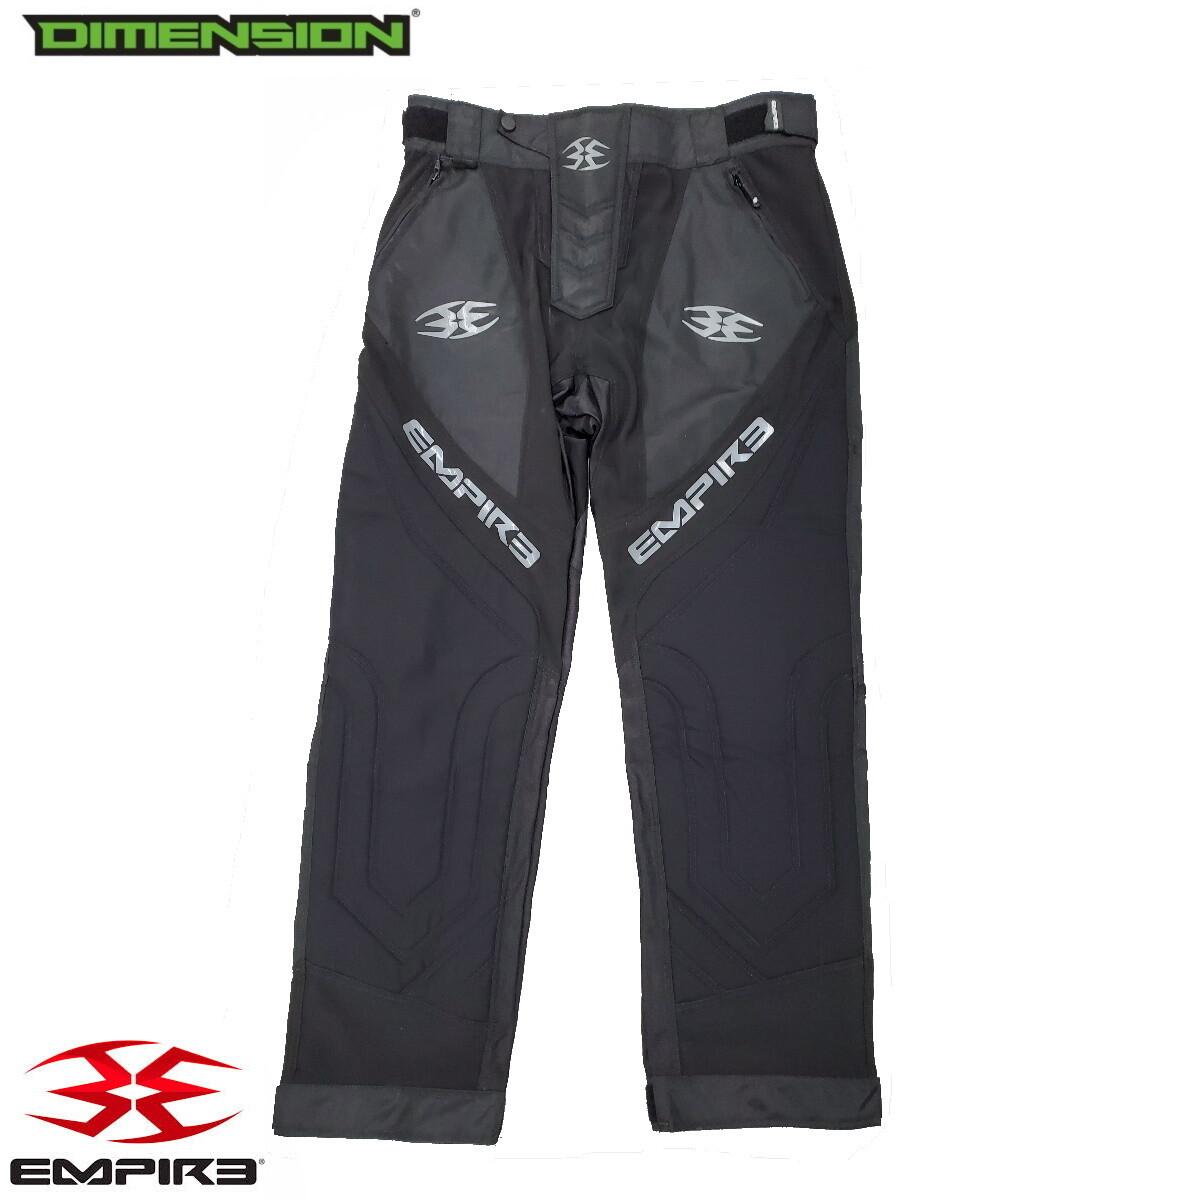 Empire Pants - Black - Large